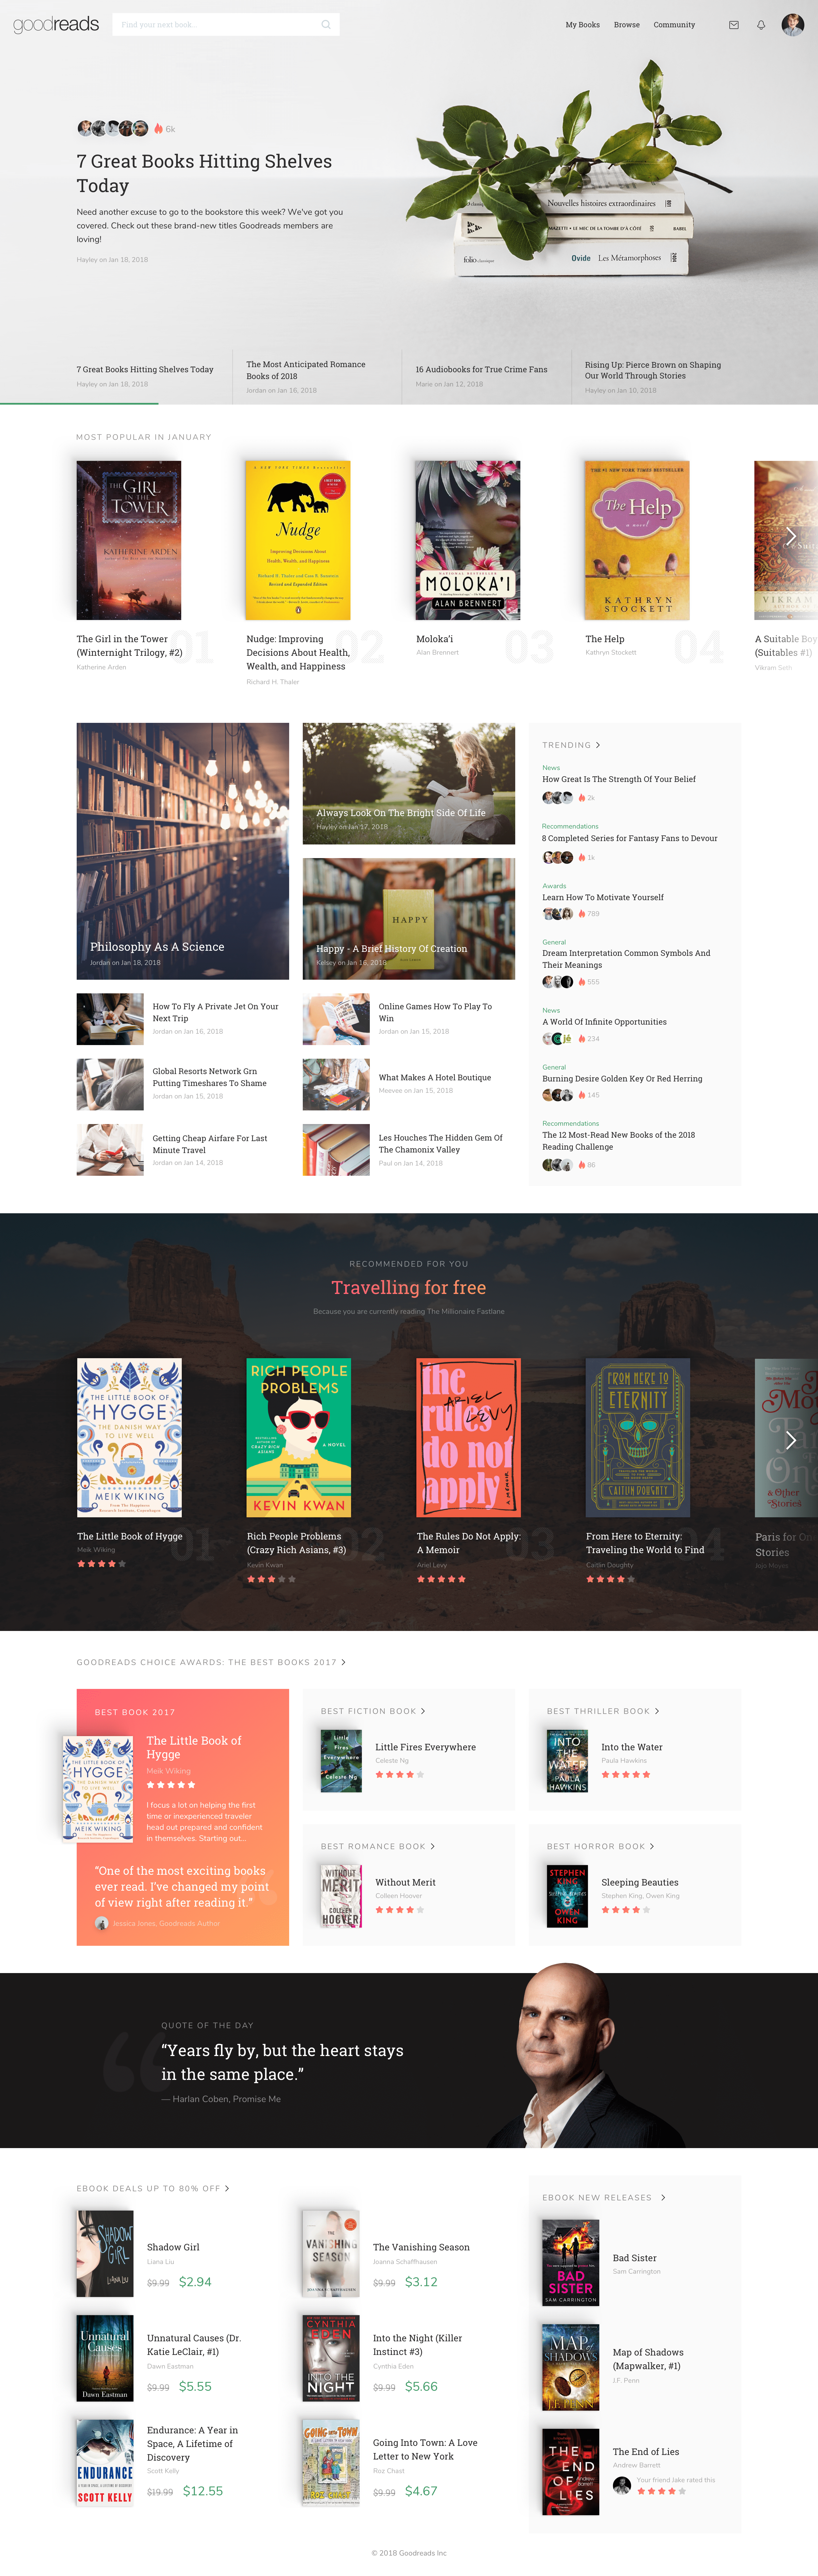 Goodreads hp 2x